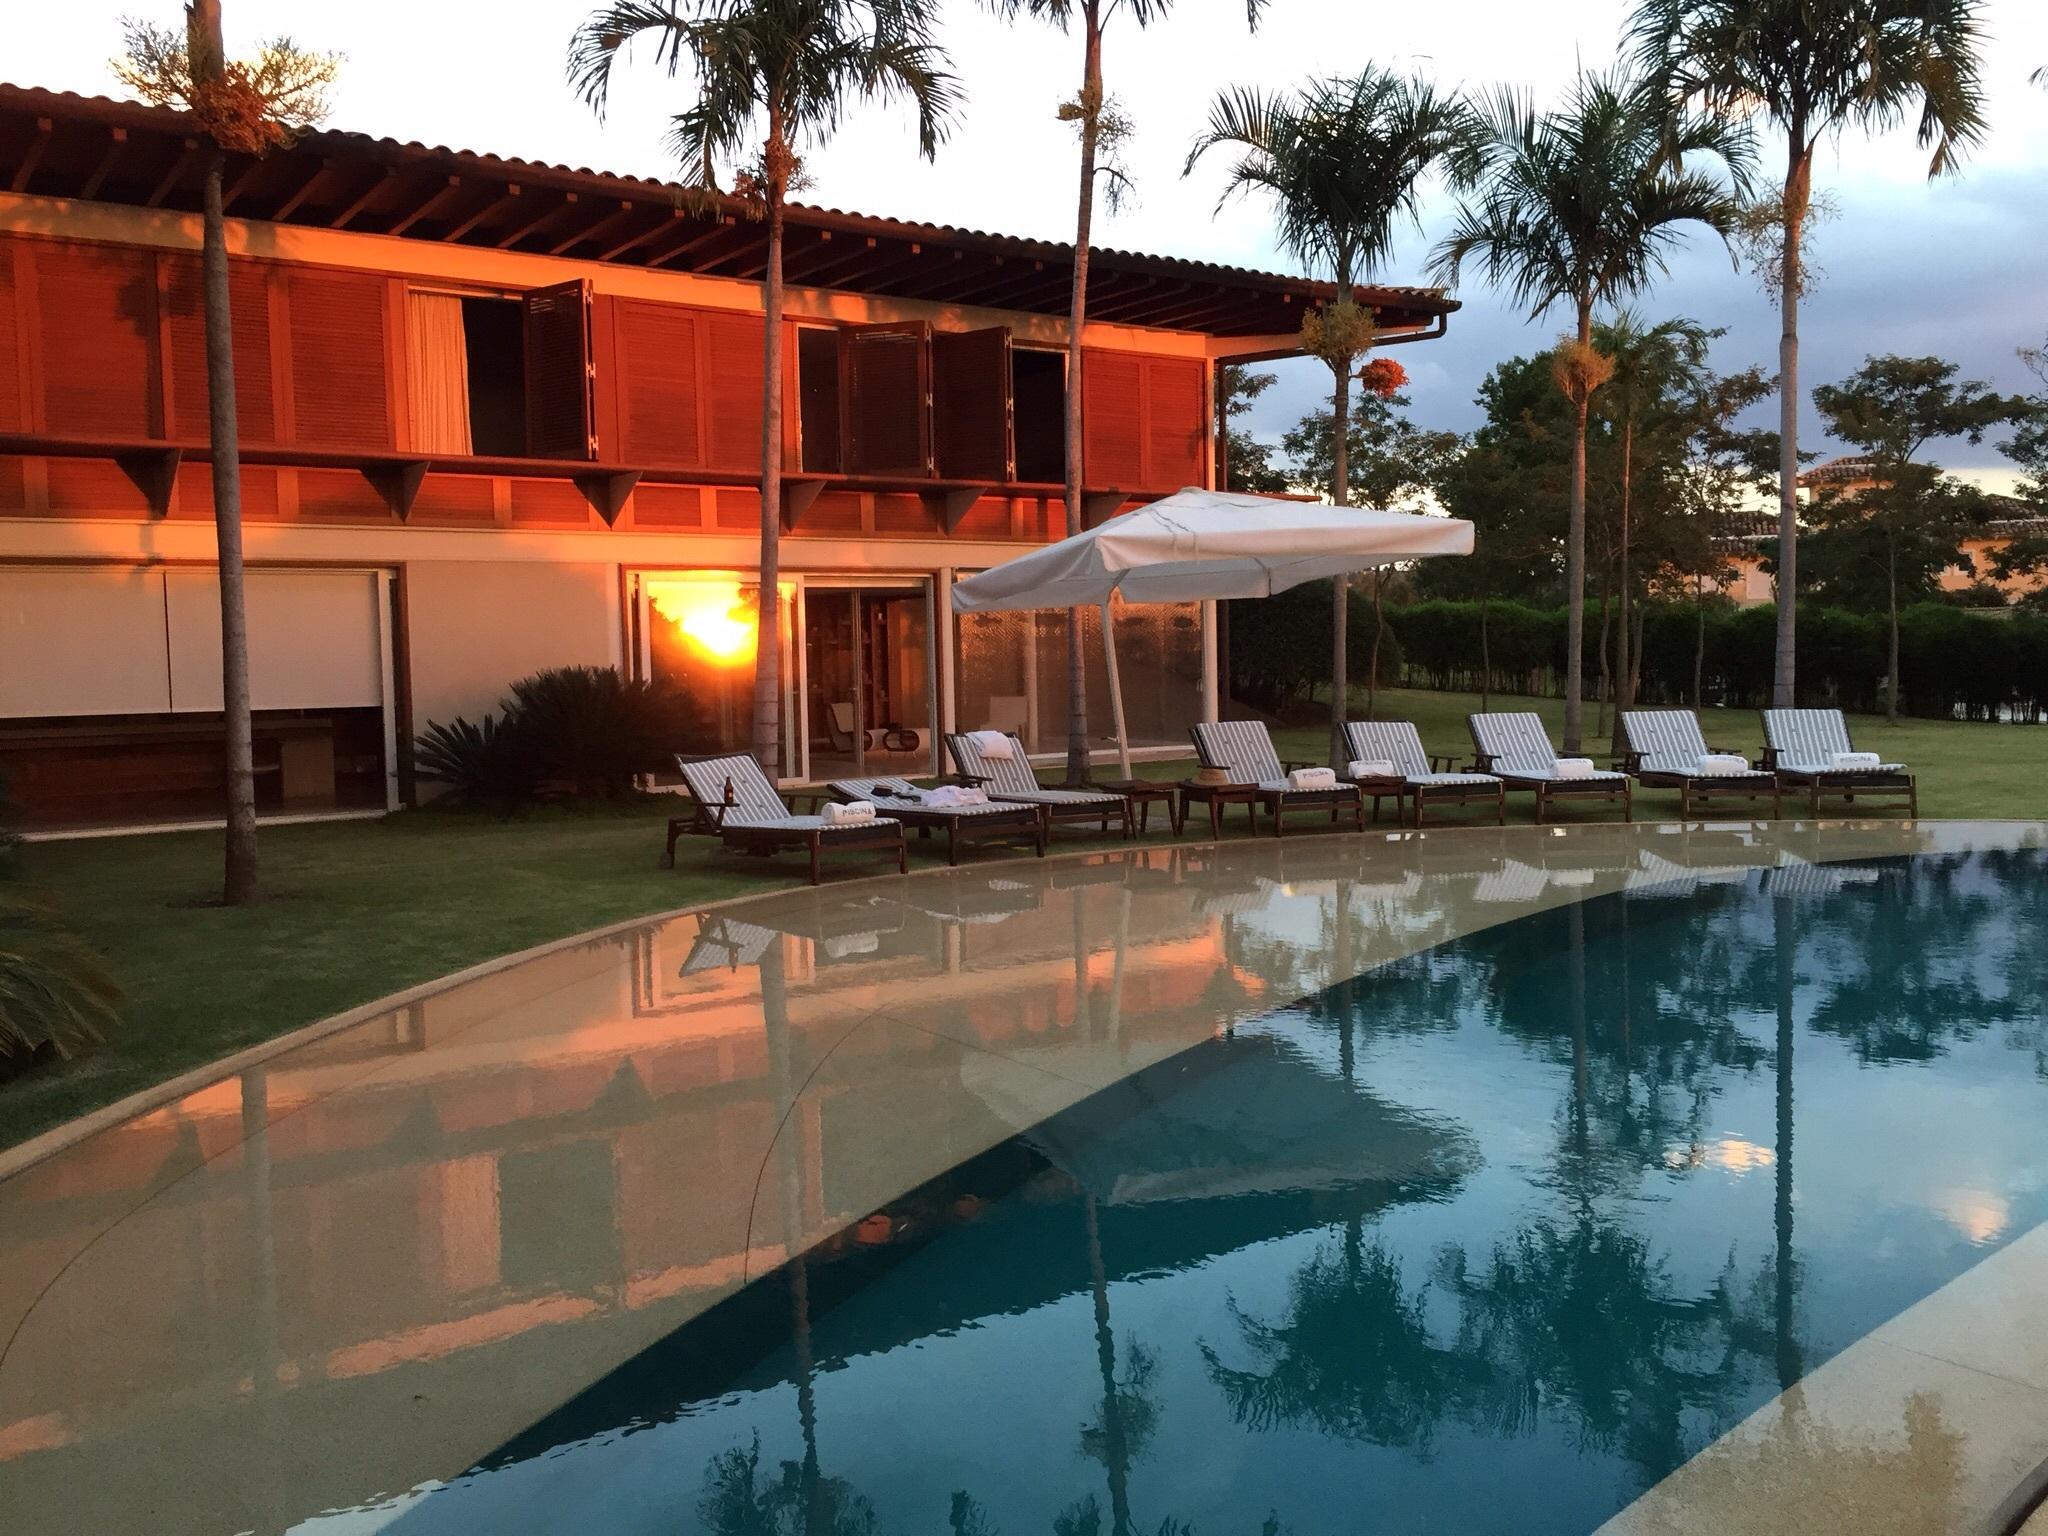 50adde5000c1e villa casa edificio casa piscina relajarse piscina patio interior fachada  propiedad recurso inmuebles parte superior fin